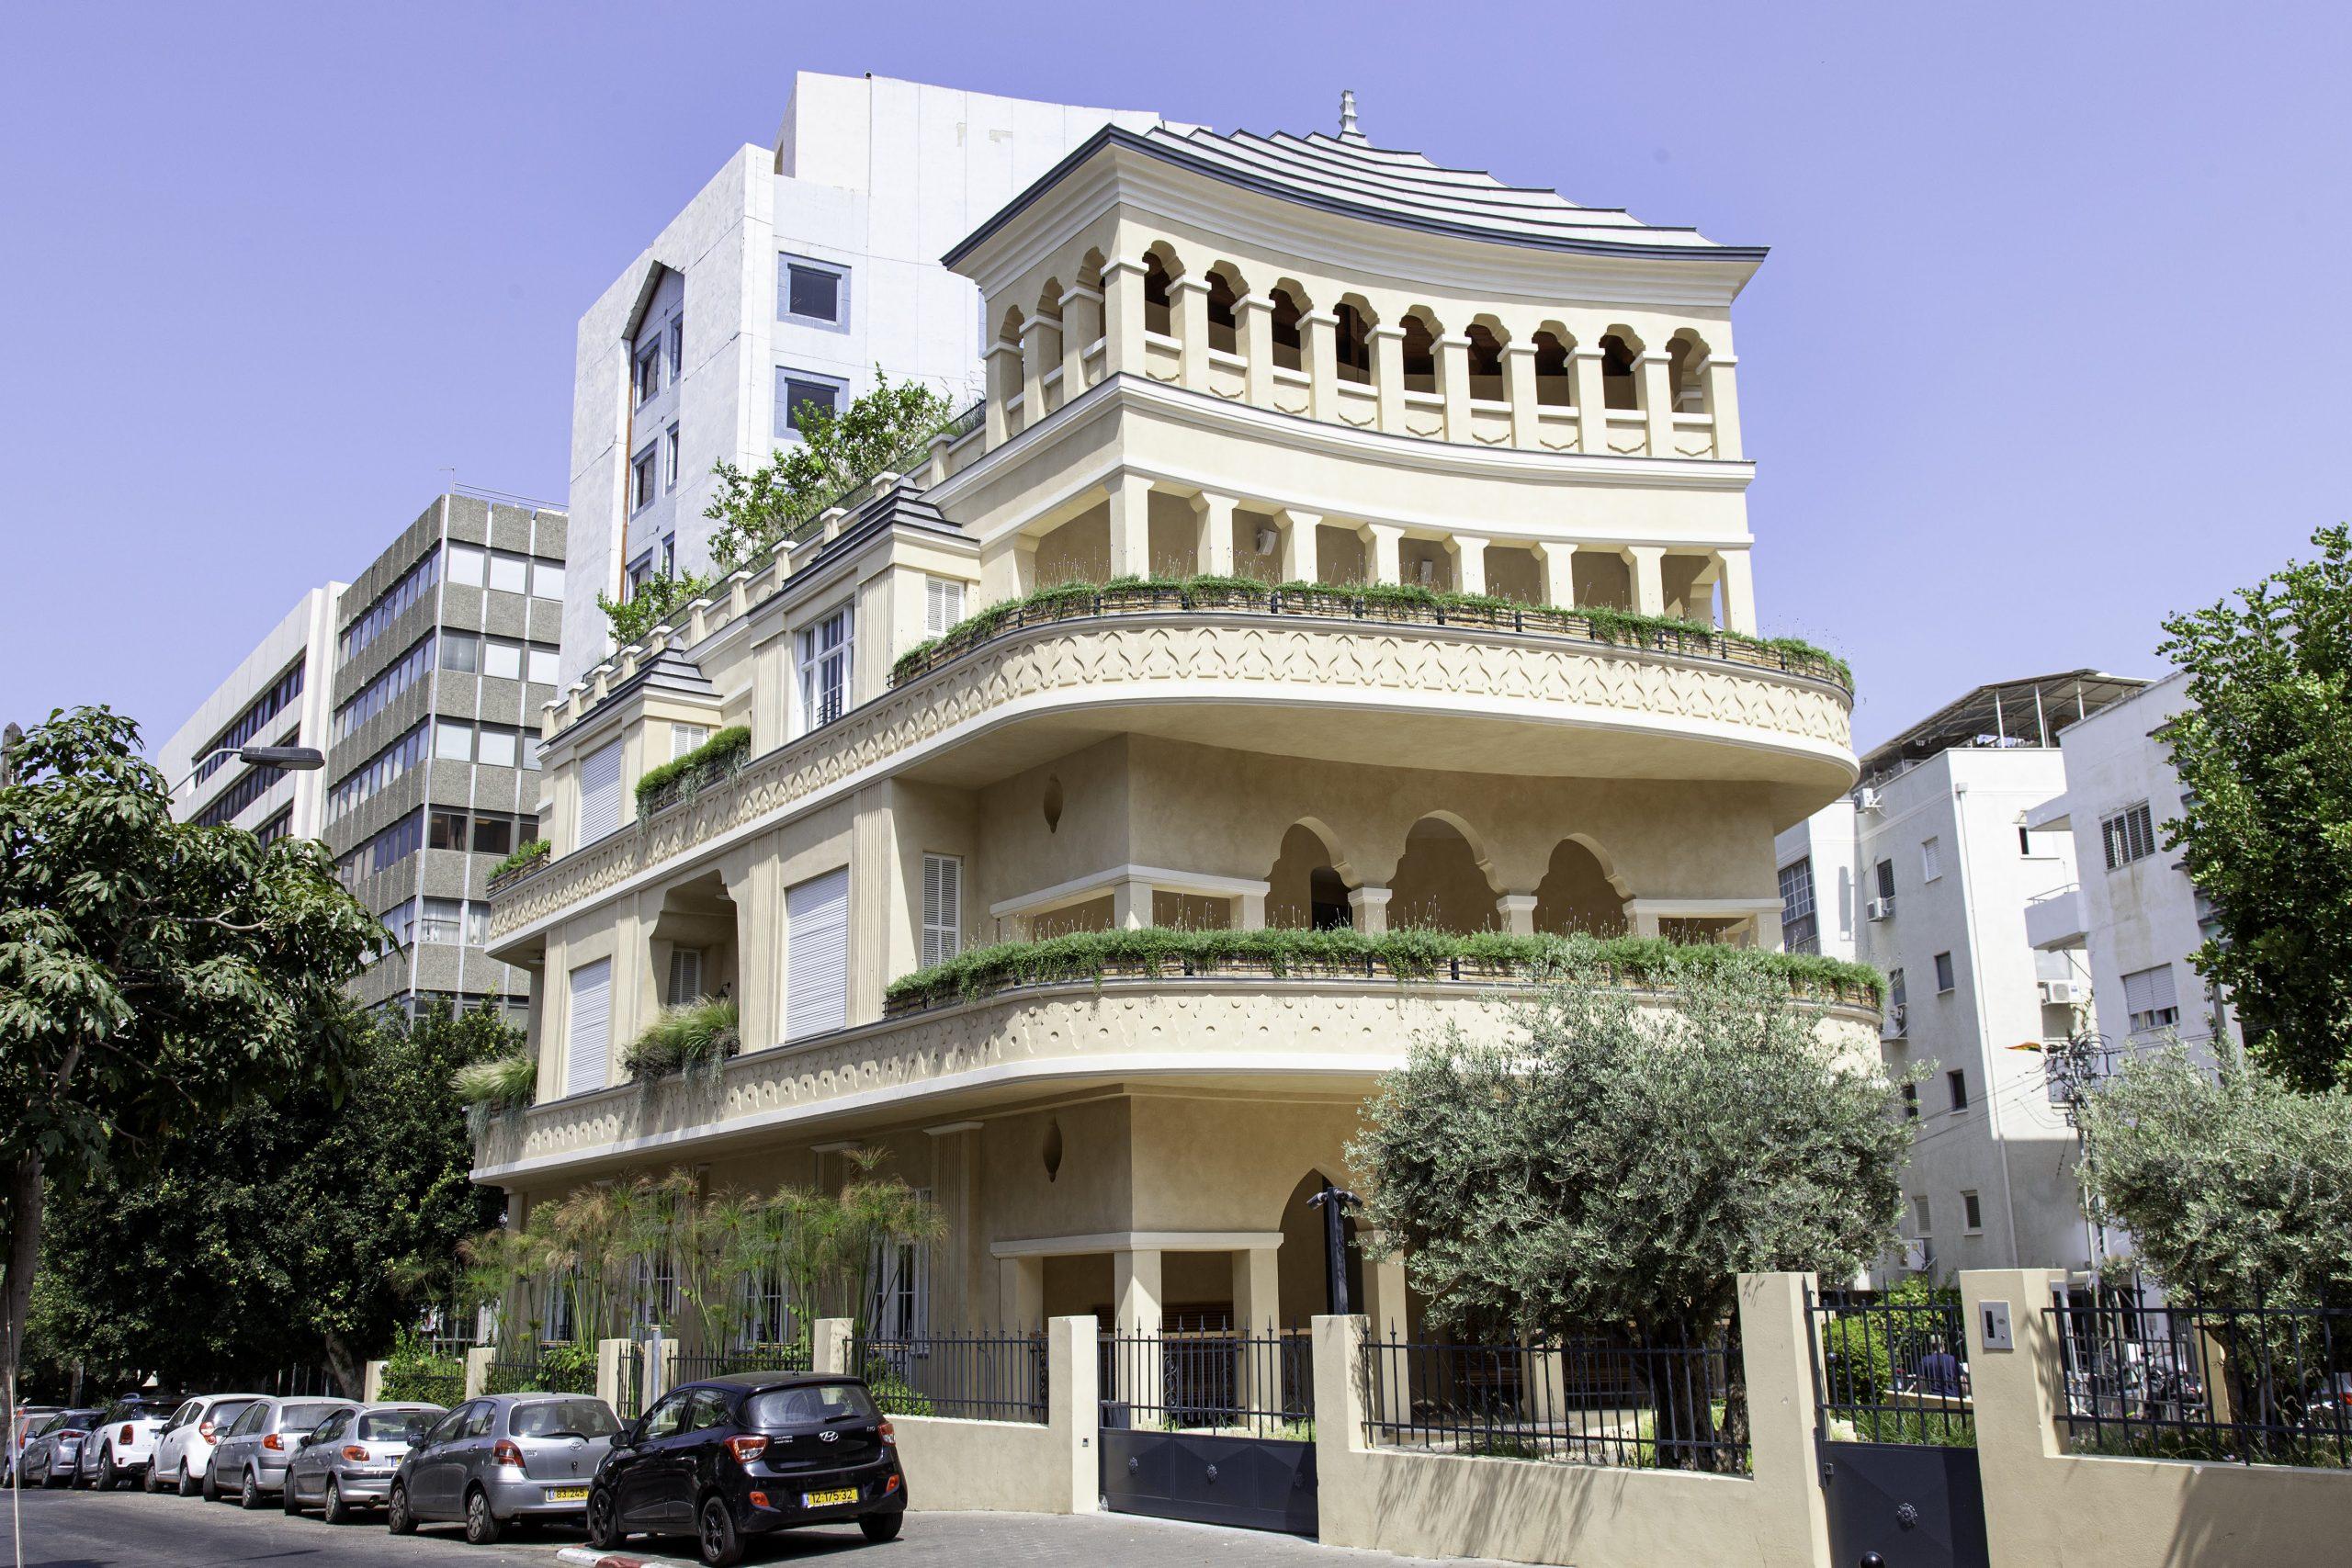 Tel Aviv White City Bauhaus Architecture Tour